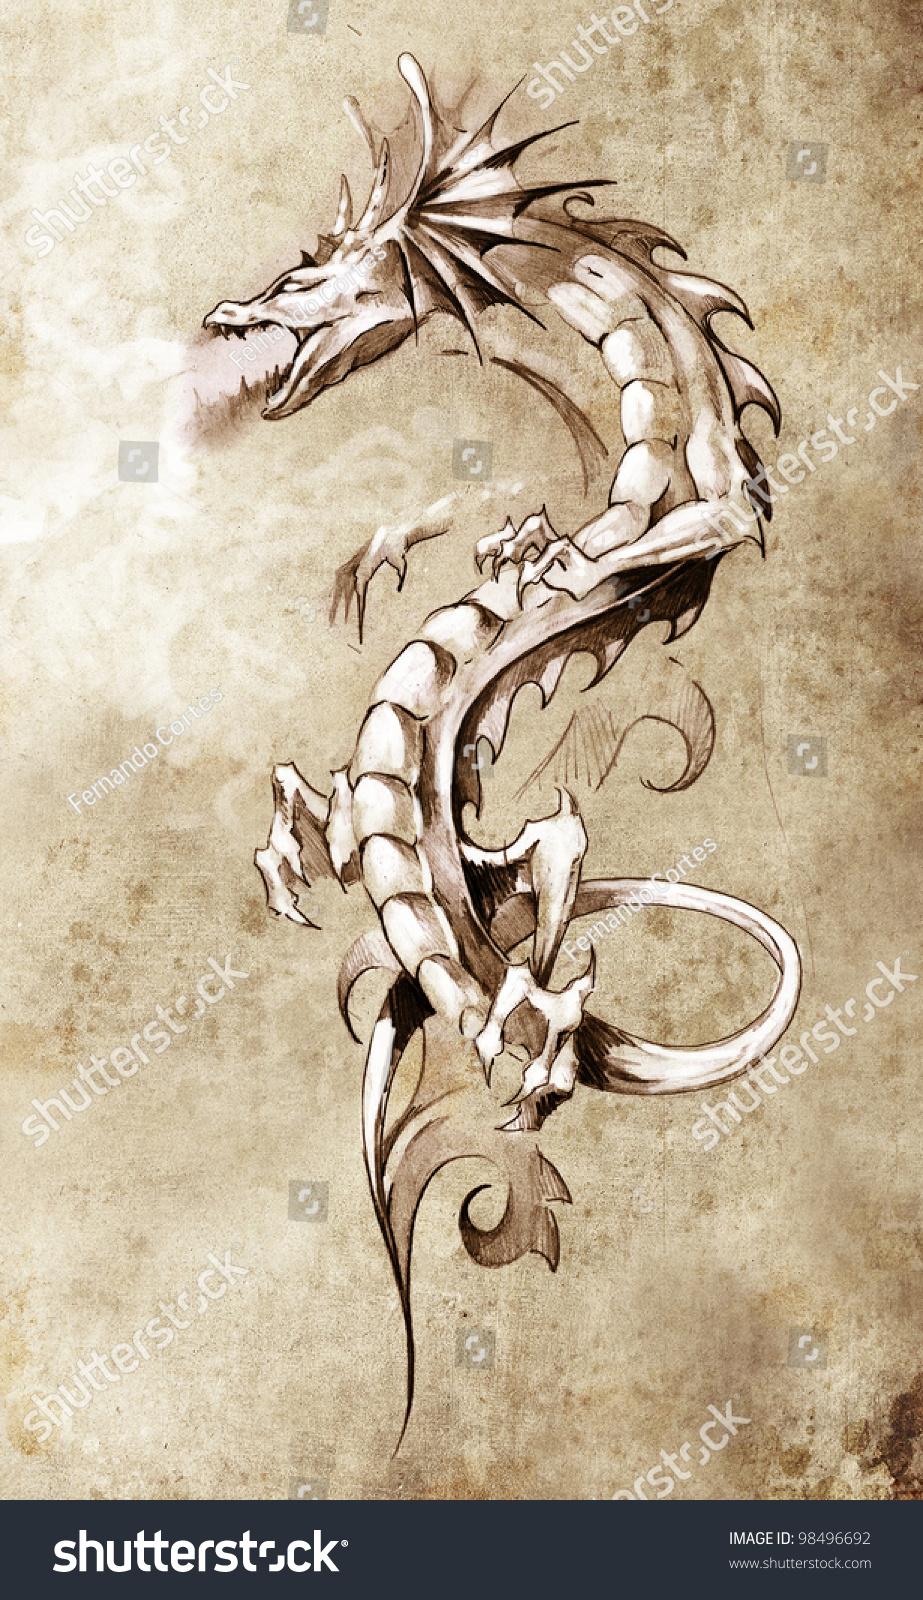 Sketch tattoo art big medieval dragon stock illustration for Medieval dragon tattoo